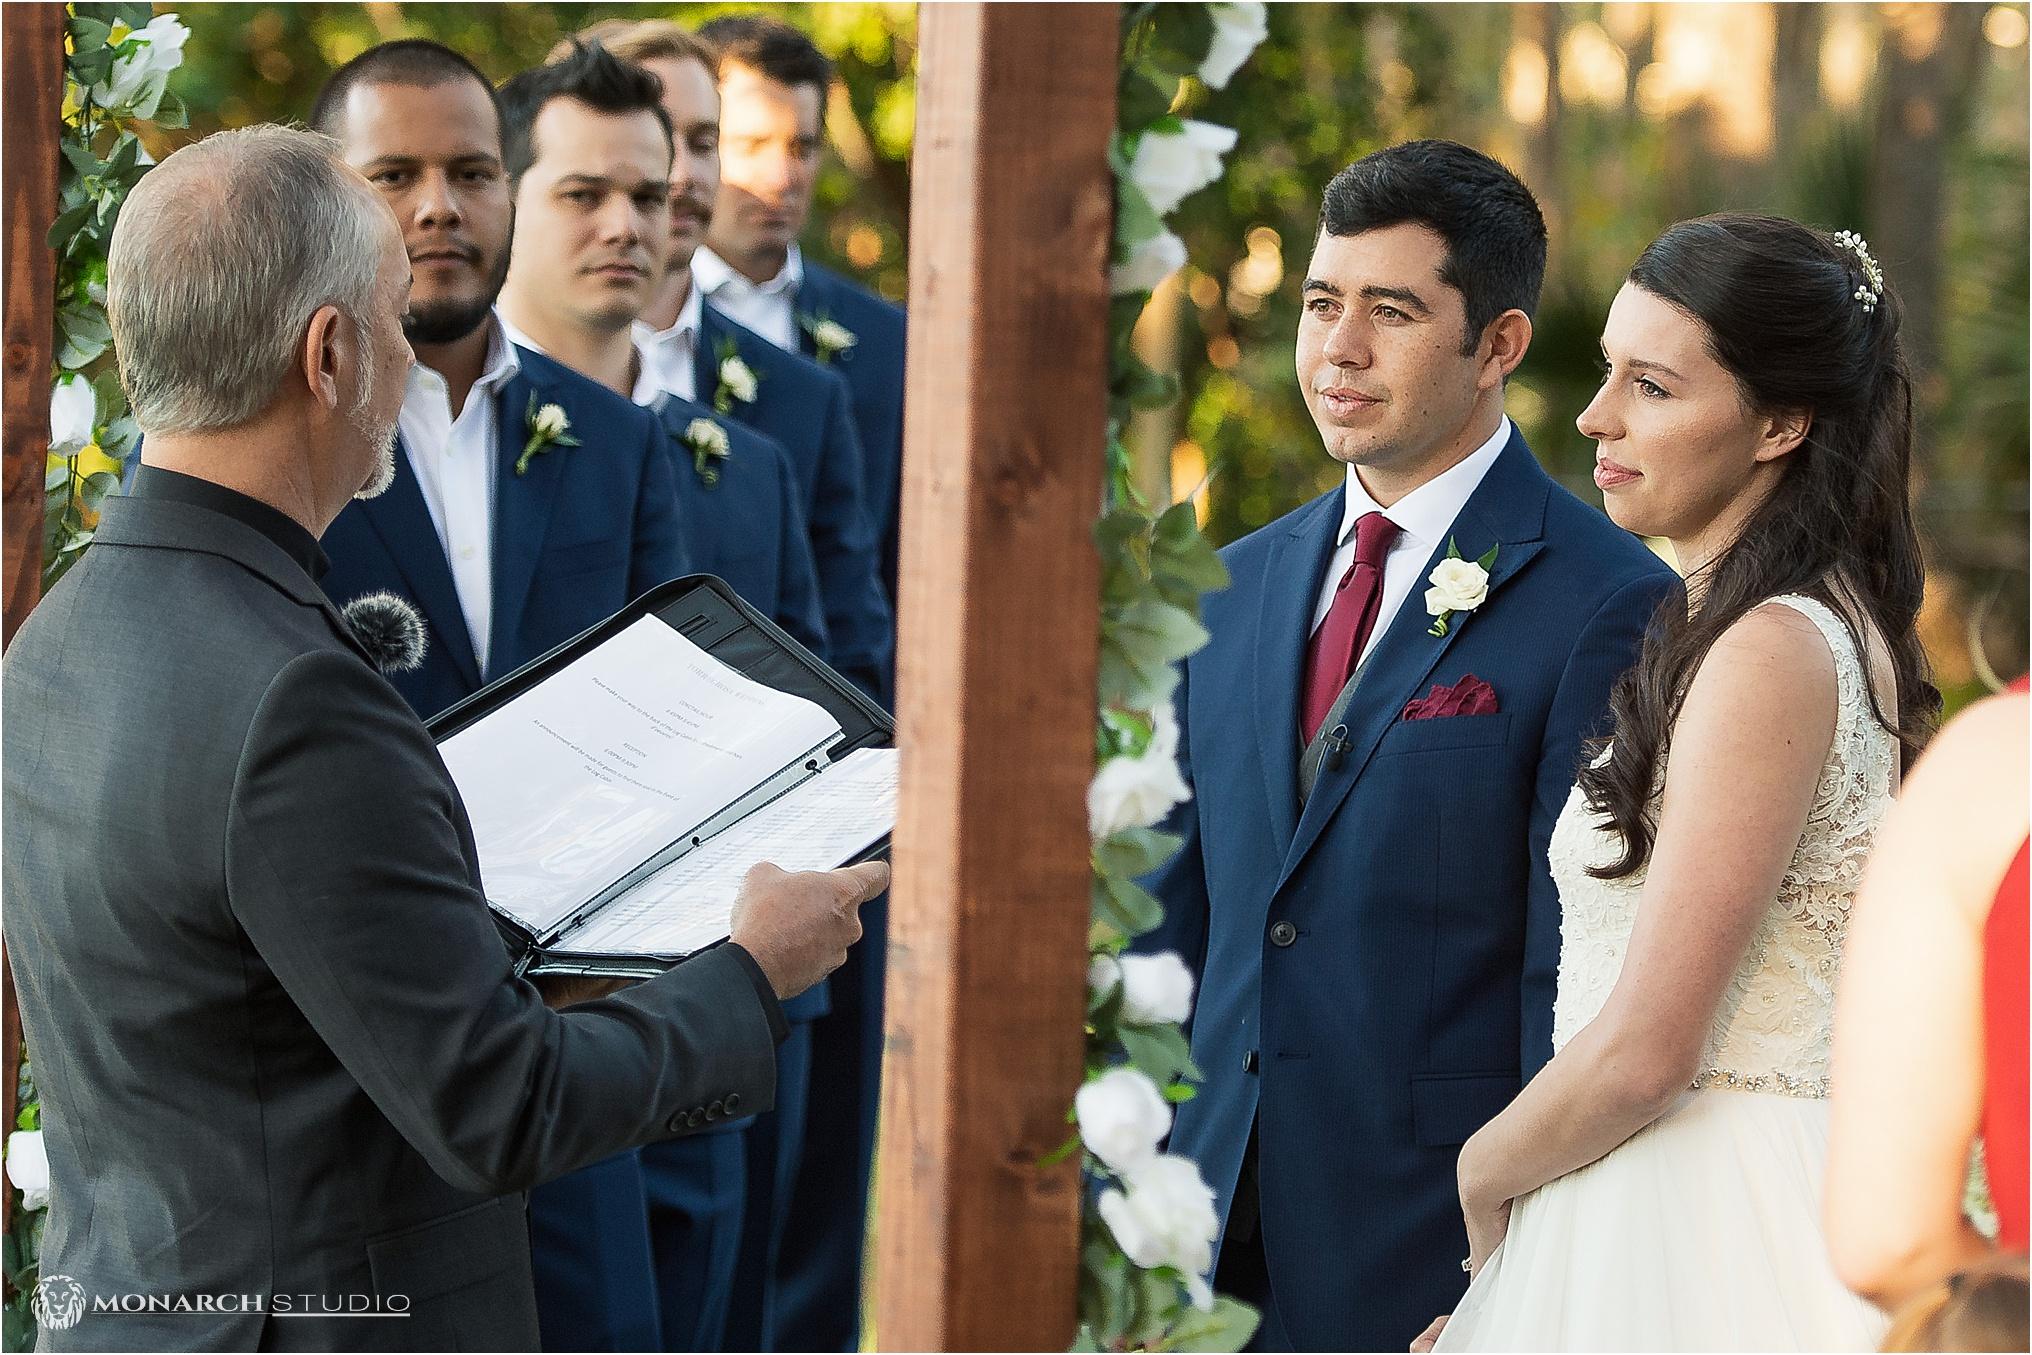 Wedding-photographer-in-sanford-florida-natural-wedding-049.jpg